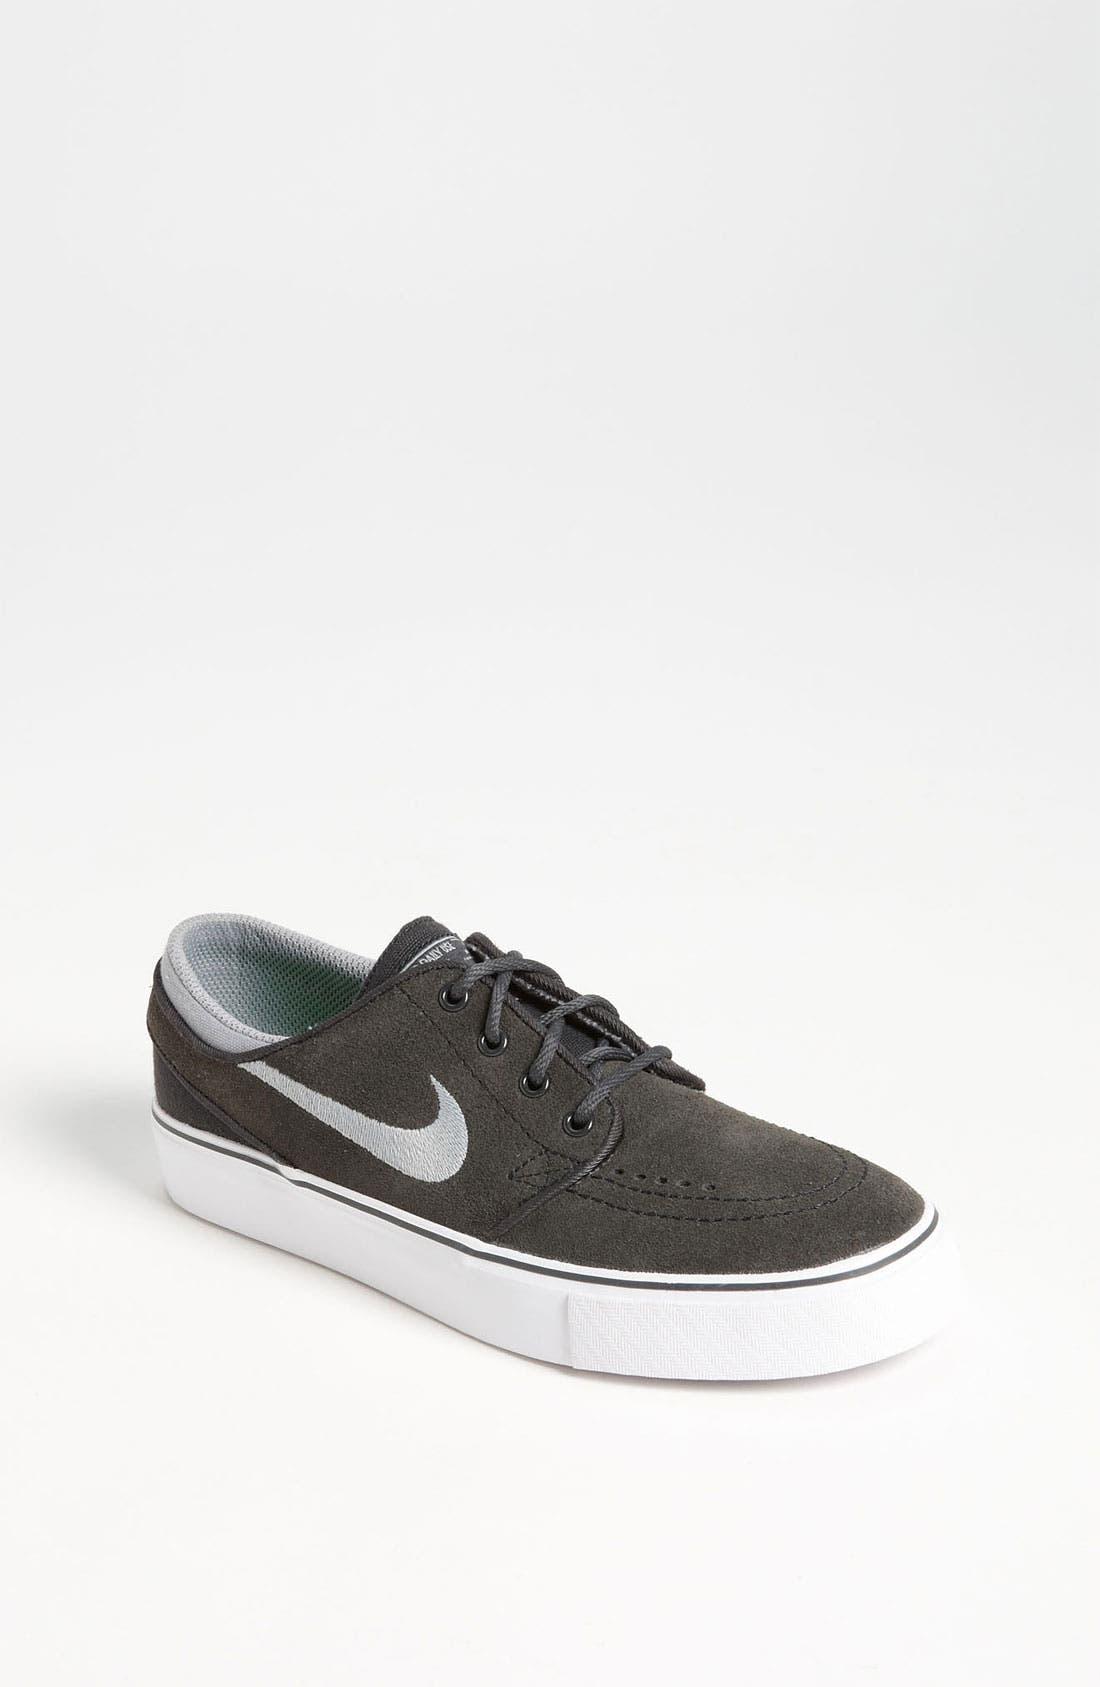 'Stefan Janoski' Sneaker,                         Main,                         color, Anthracite/ Grey